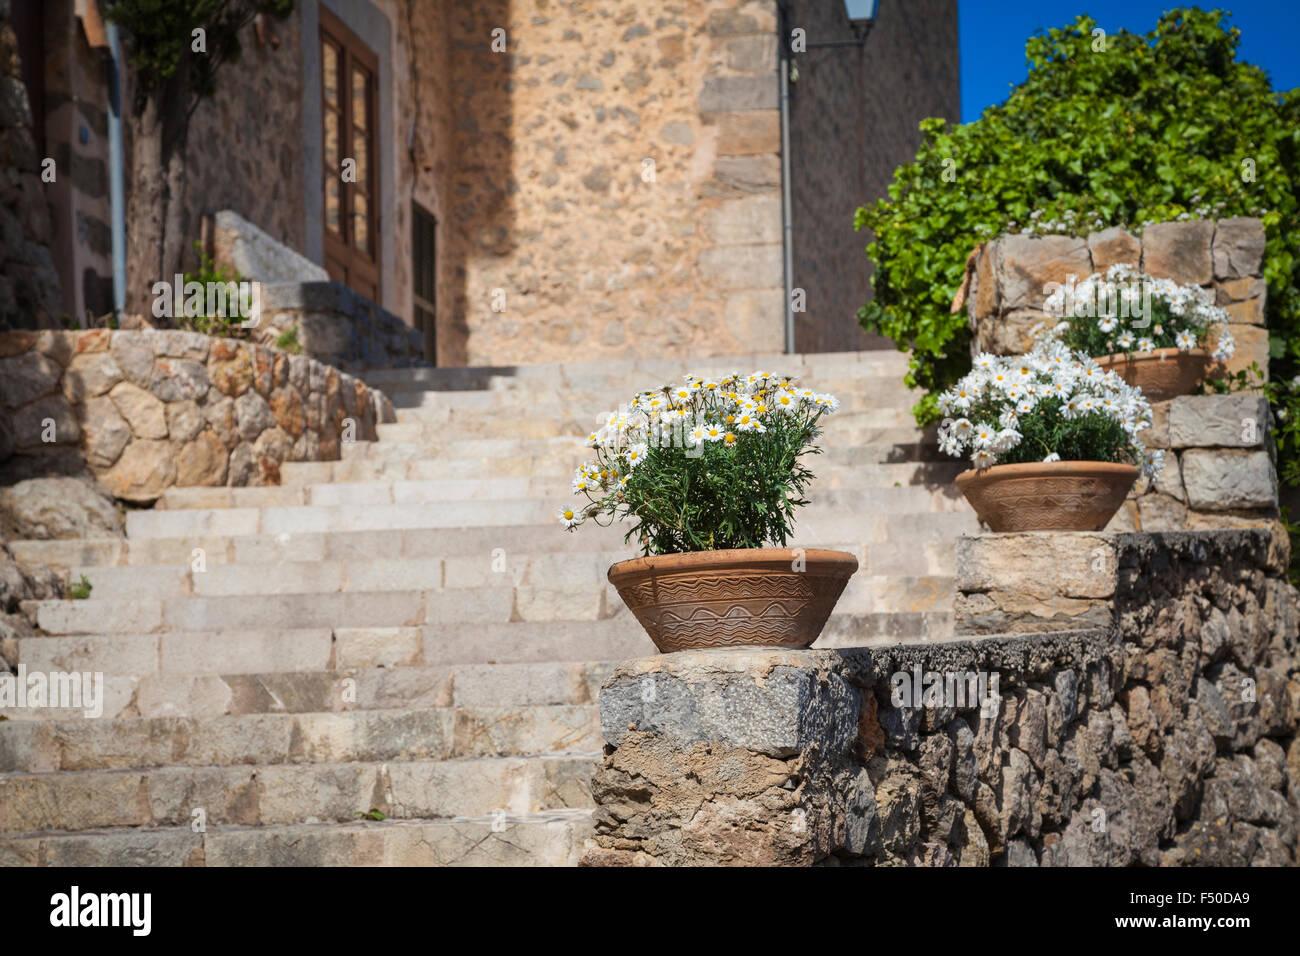 Village of Deia on the island of Mallorca - Stock Image